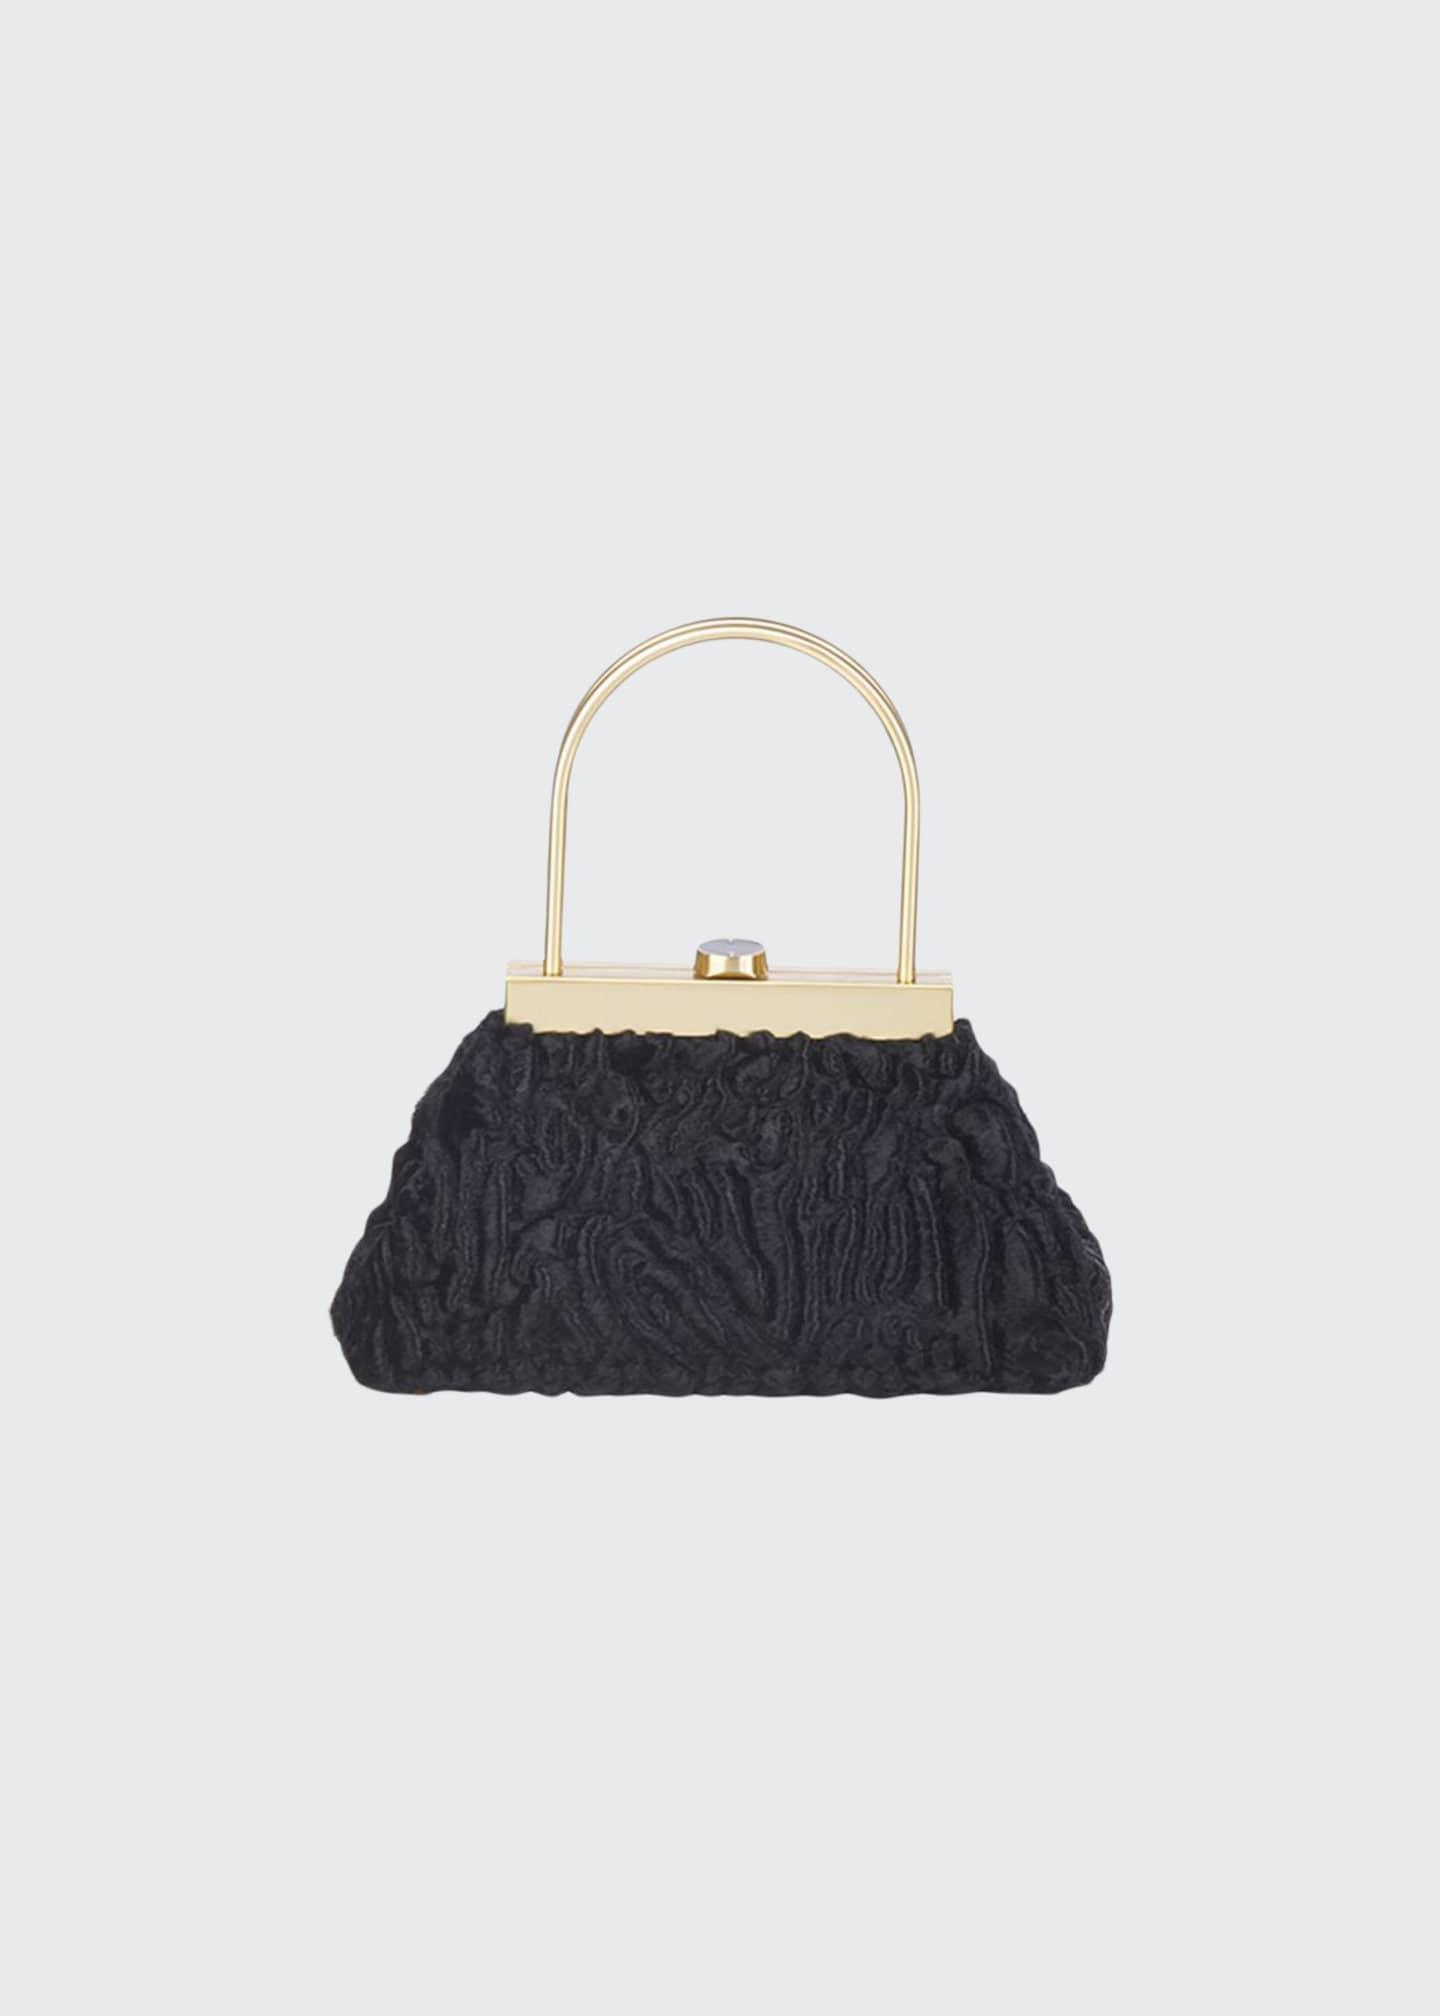 Cult Gaia Estelle Mini Ruffle Top Handle Bag